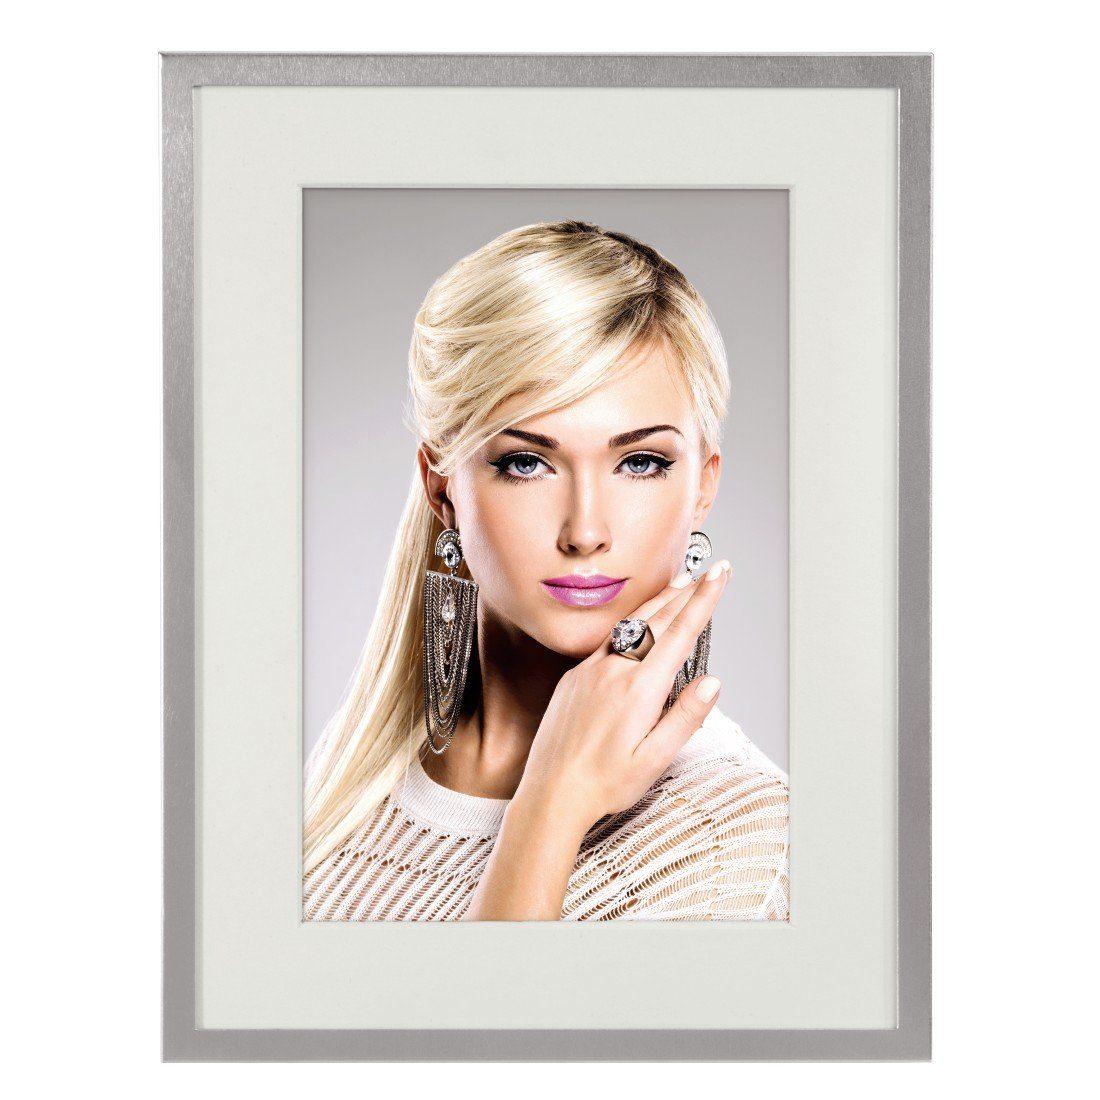 Hama Porträtrahmen Nottingham, Silber, weißes Passepartout, 10 x 15